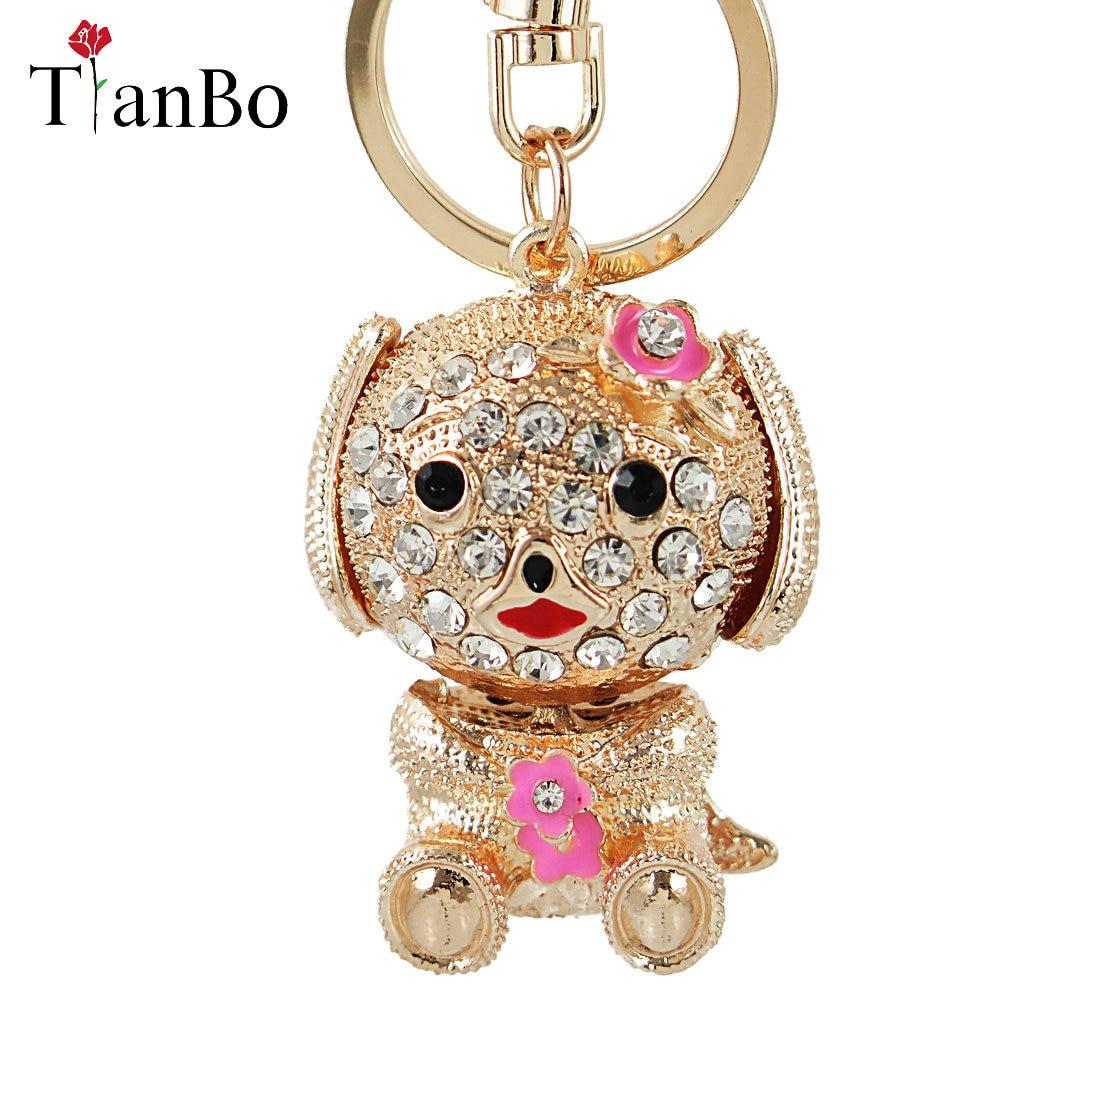 LC/_ Cute Elephant Keychain Bling Rhinestone Key Ring bag Charm Pendant Gift Gr